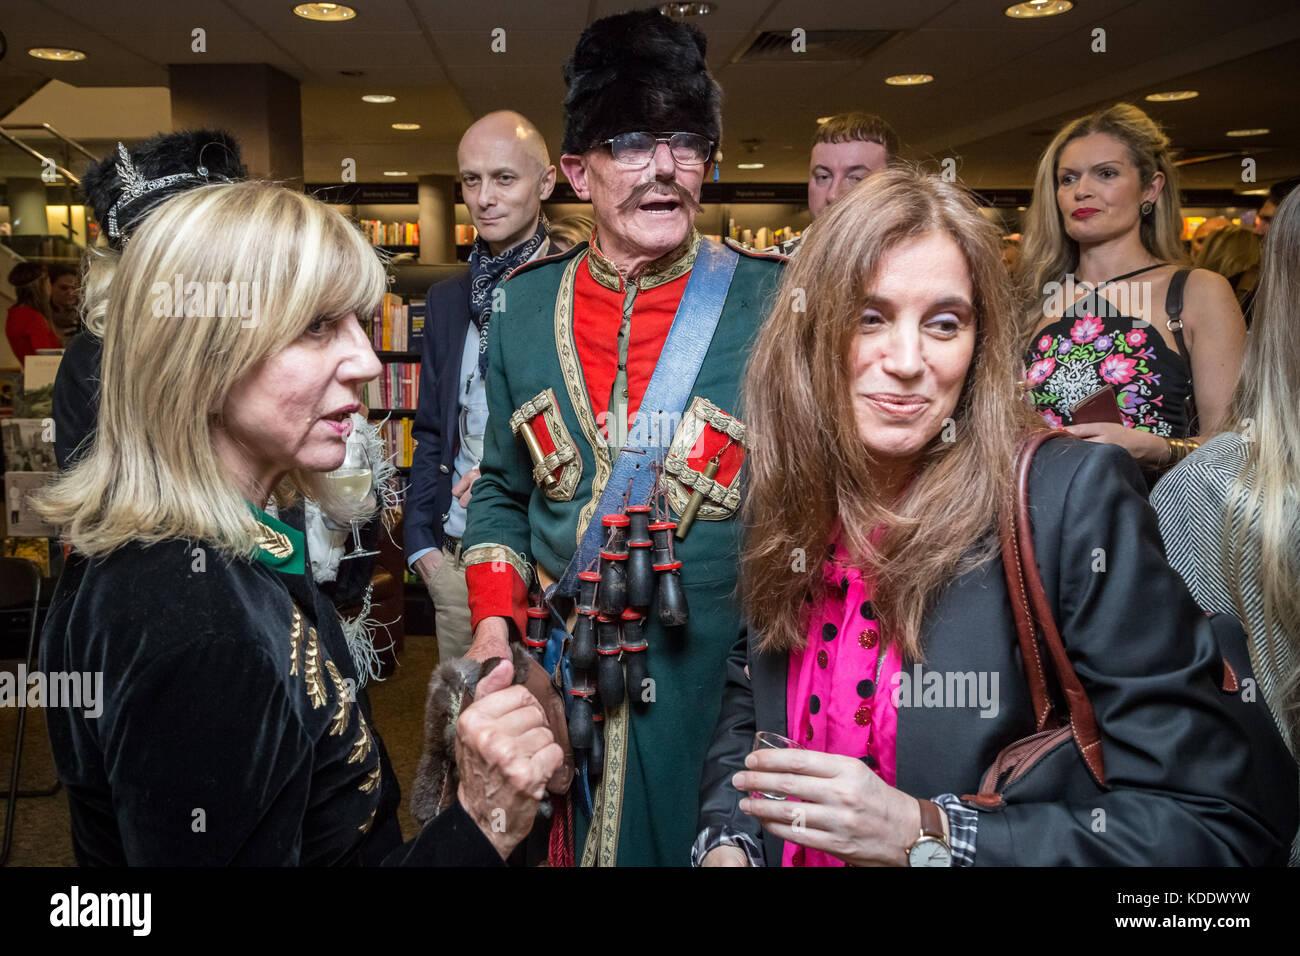 London, UK. 12th Oct, 2017. Princess Olga Romanoff (in blue), descendant of the last Tsar of Russia, Nicholas II, - Stock Image